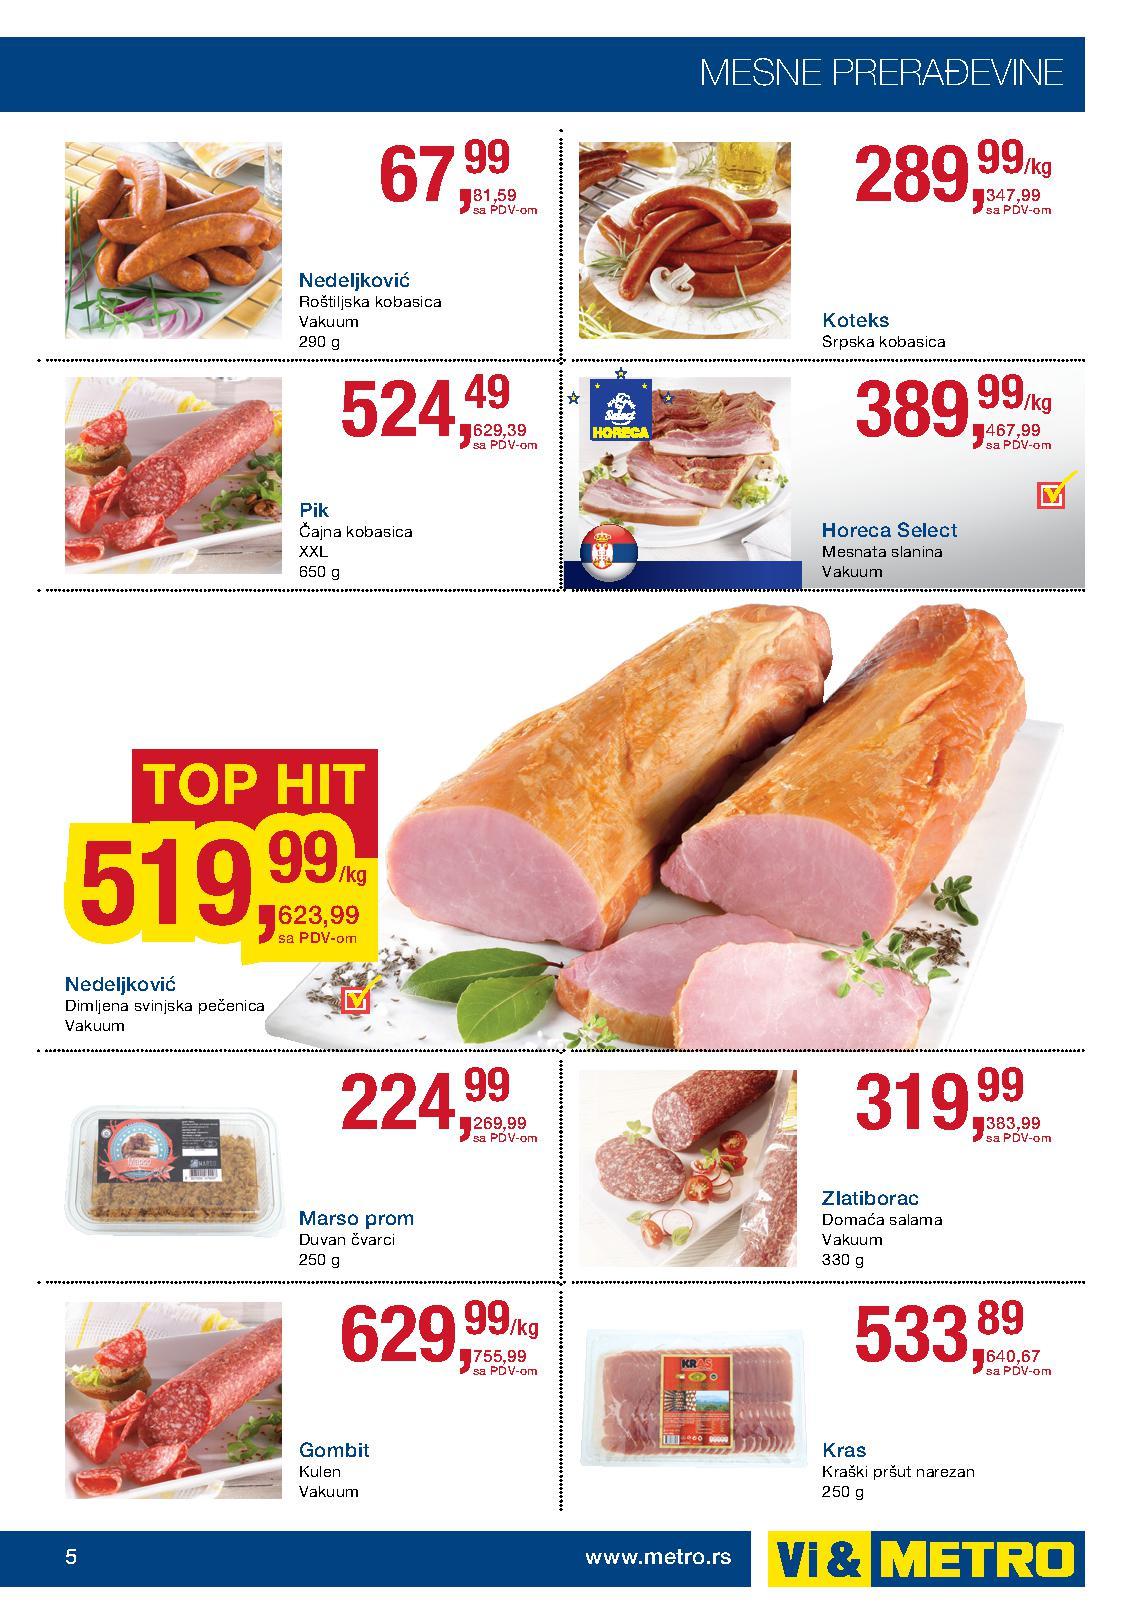 Metro akcija dobra ponuda prehrane